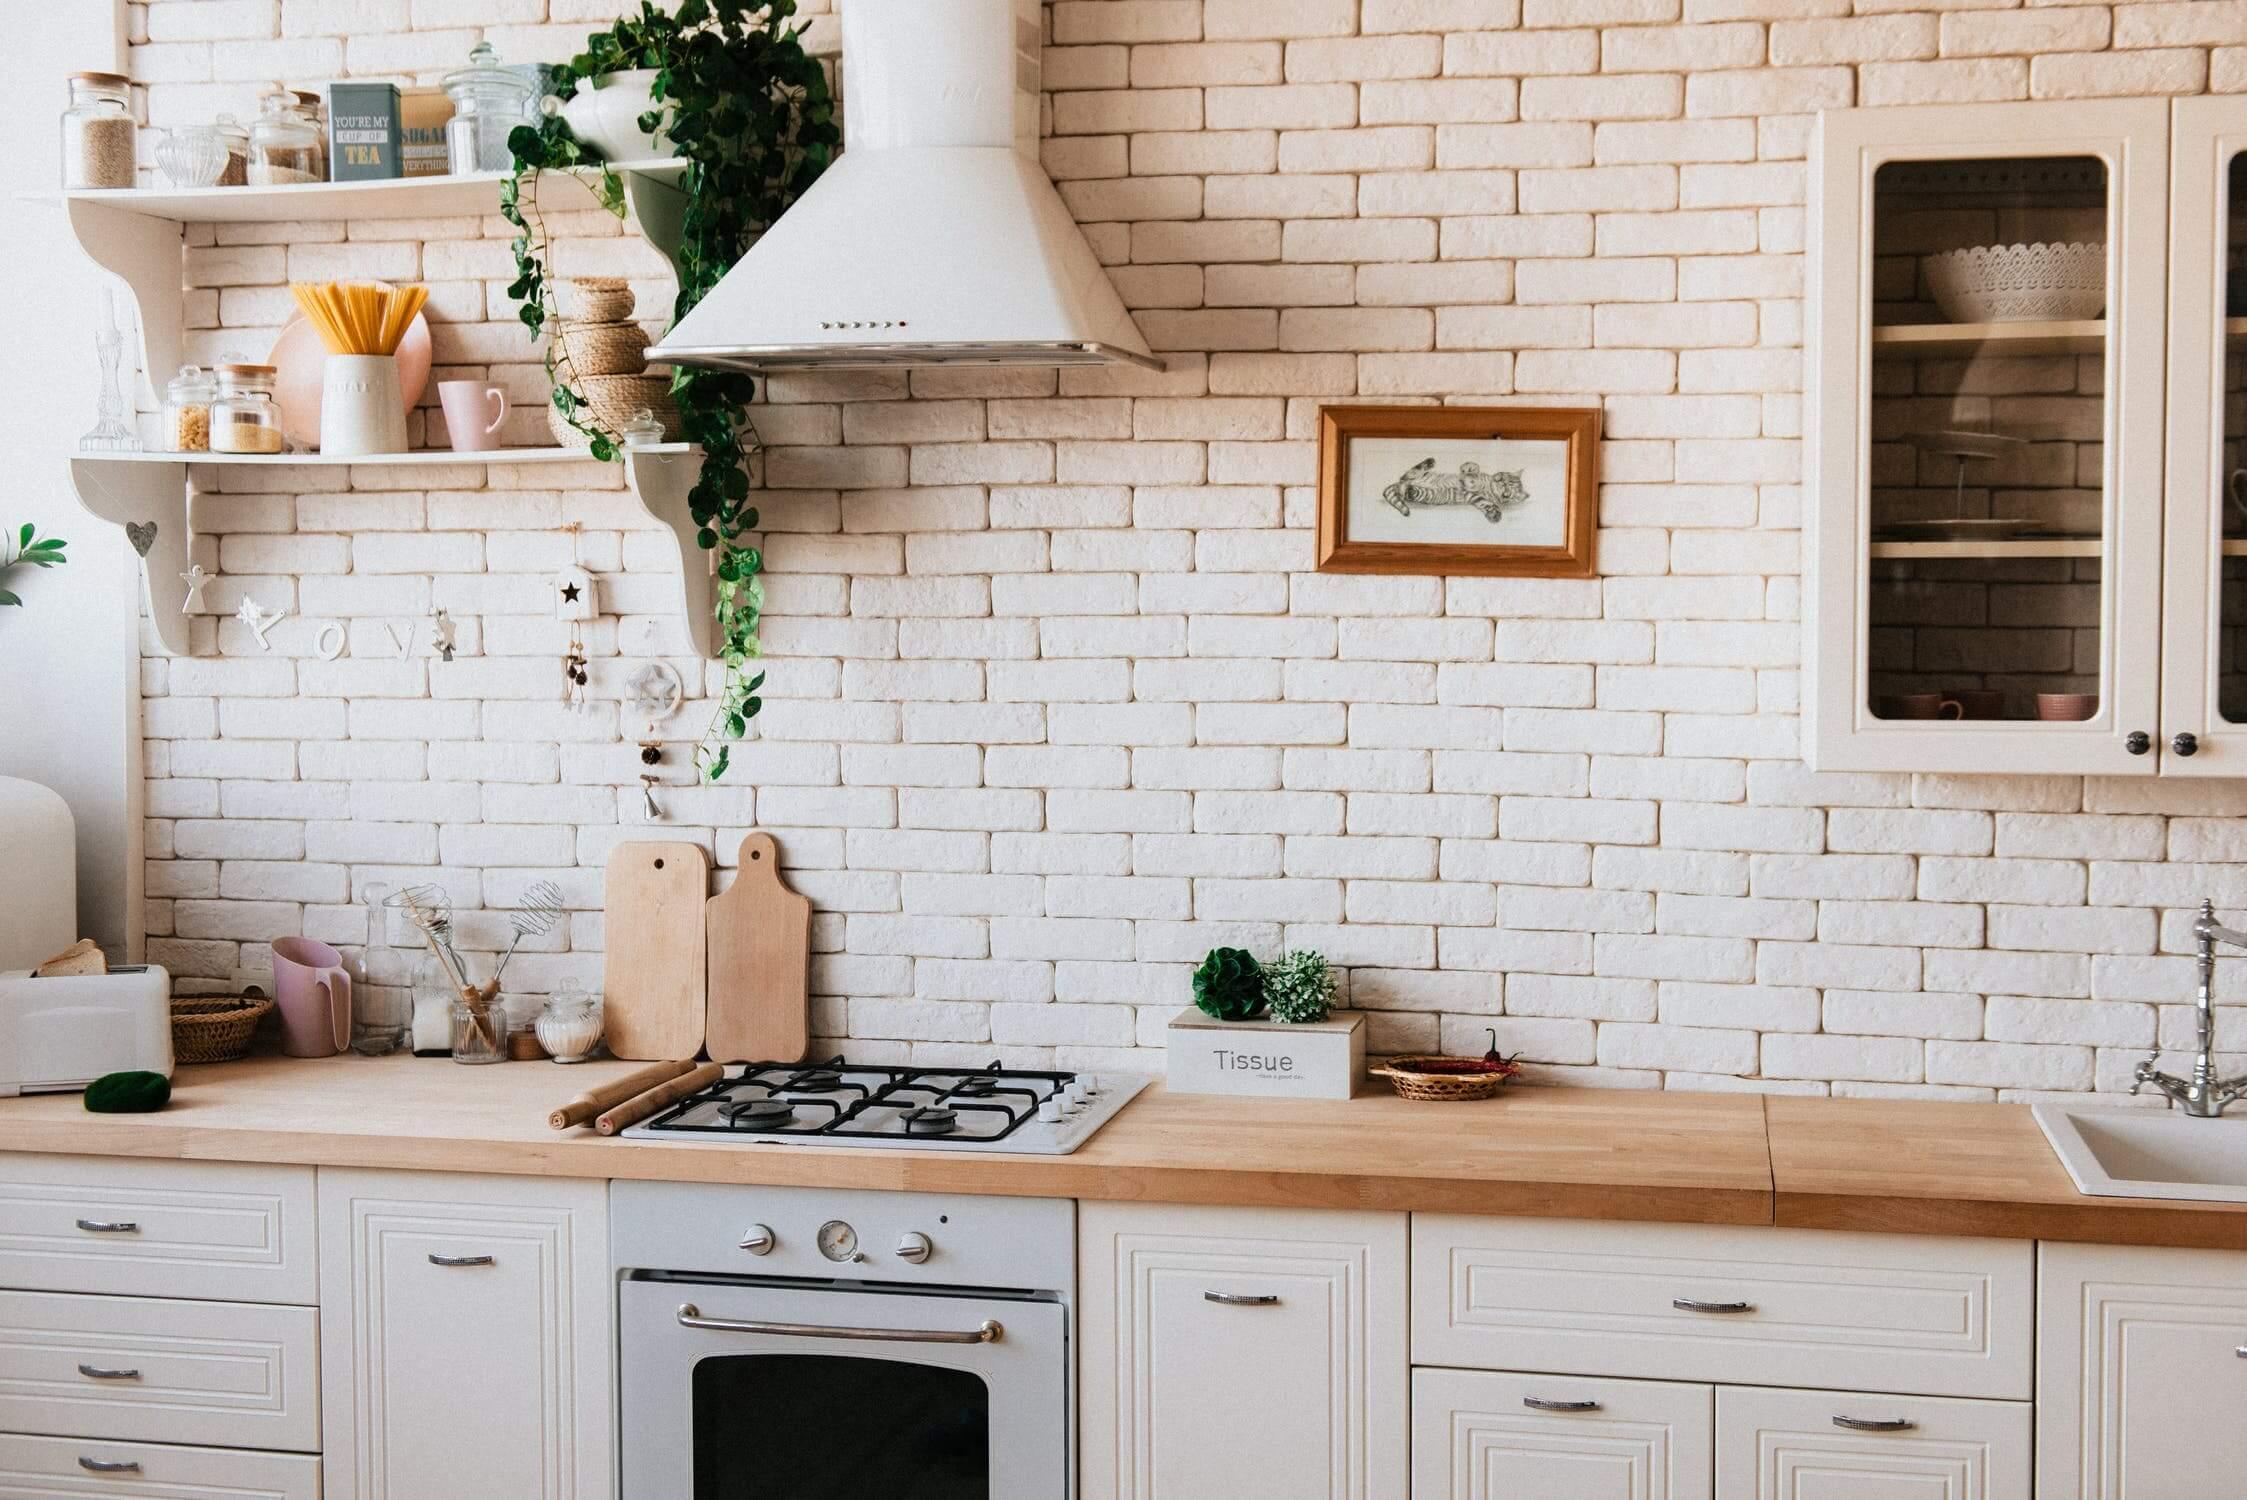 A kitchen in a senior apartment